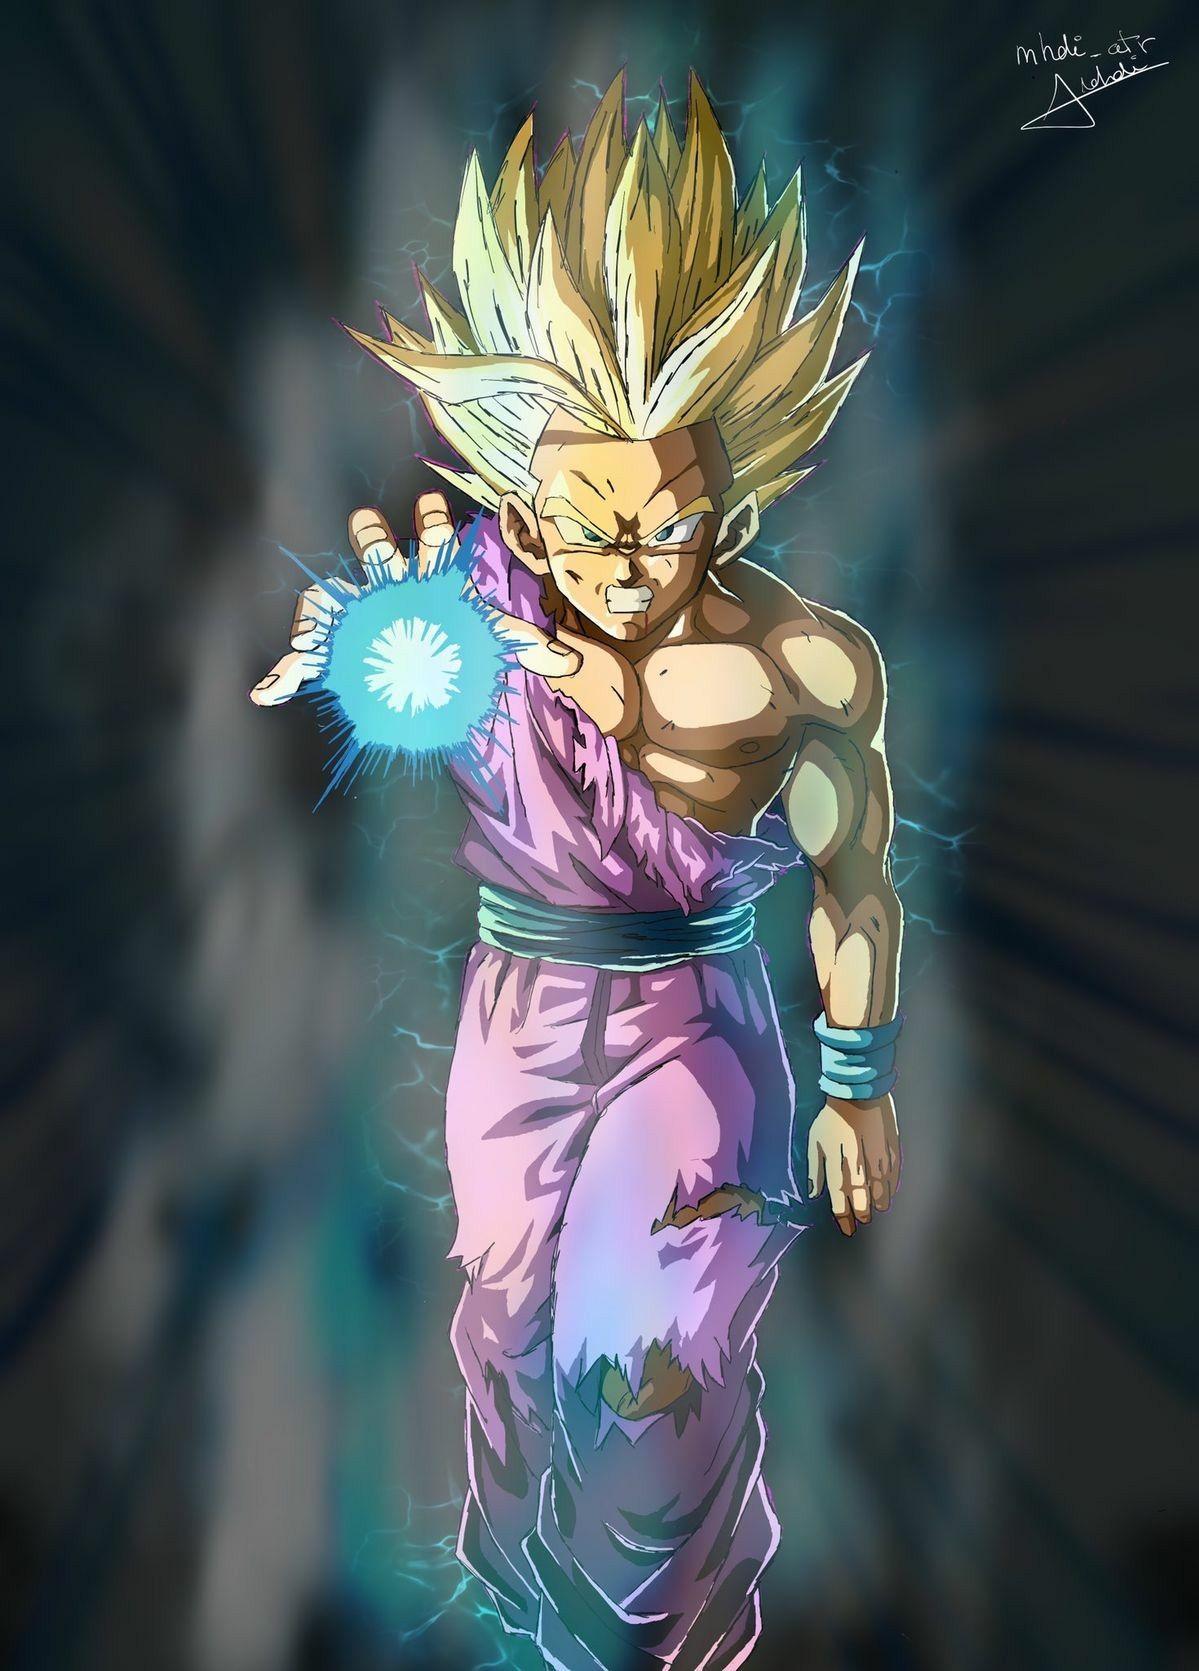 Watch Dragon Ball Super on www.animeuniverse.watch